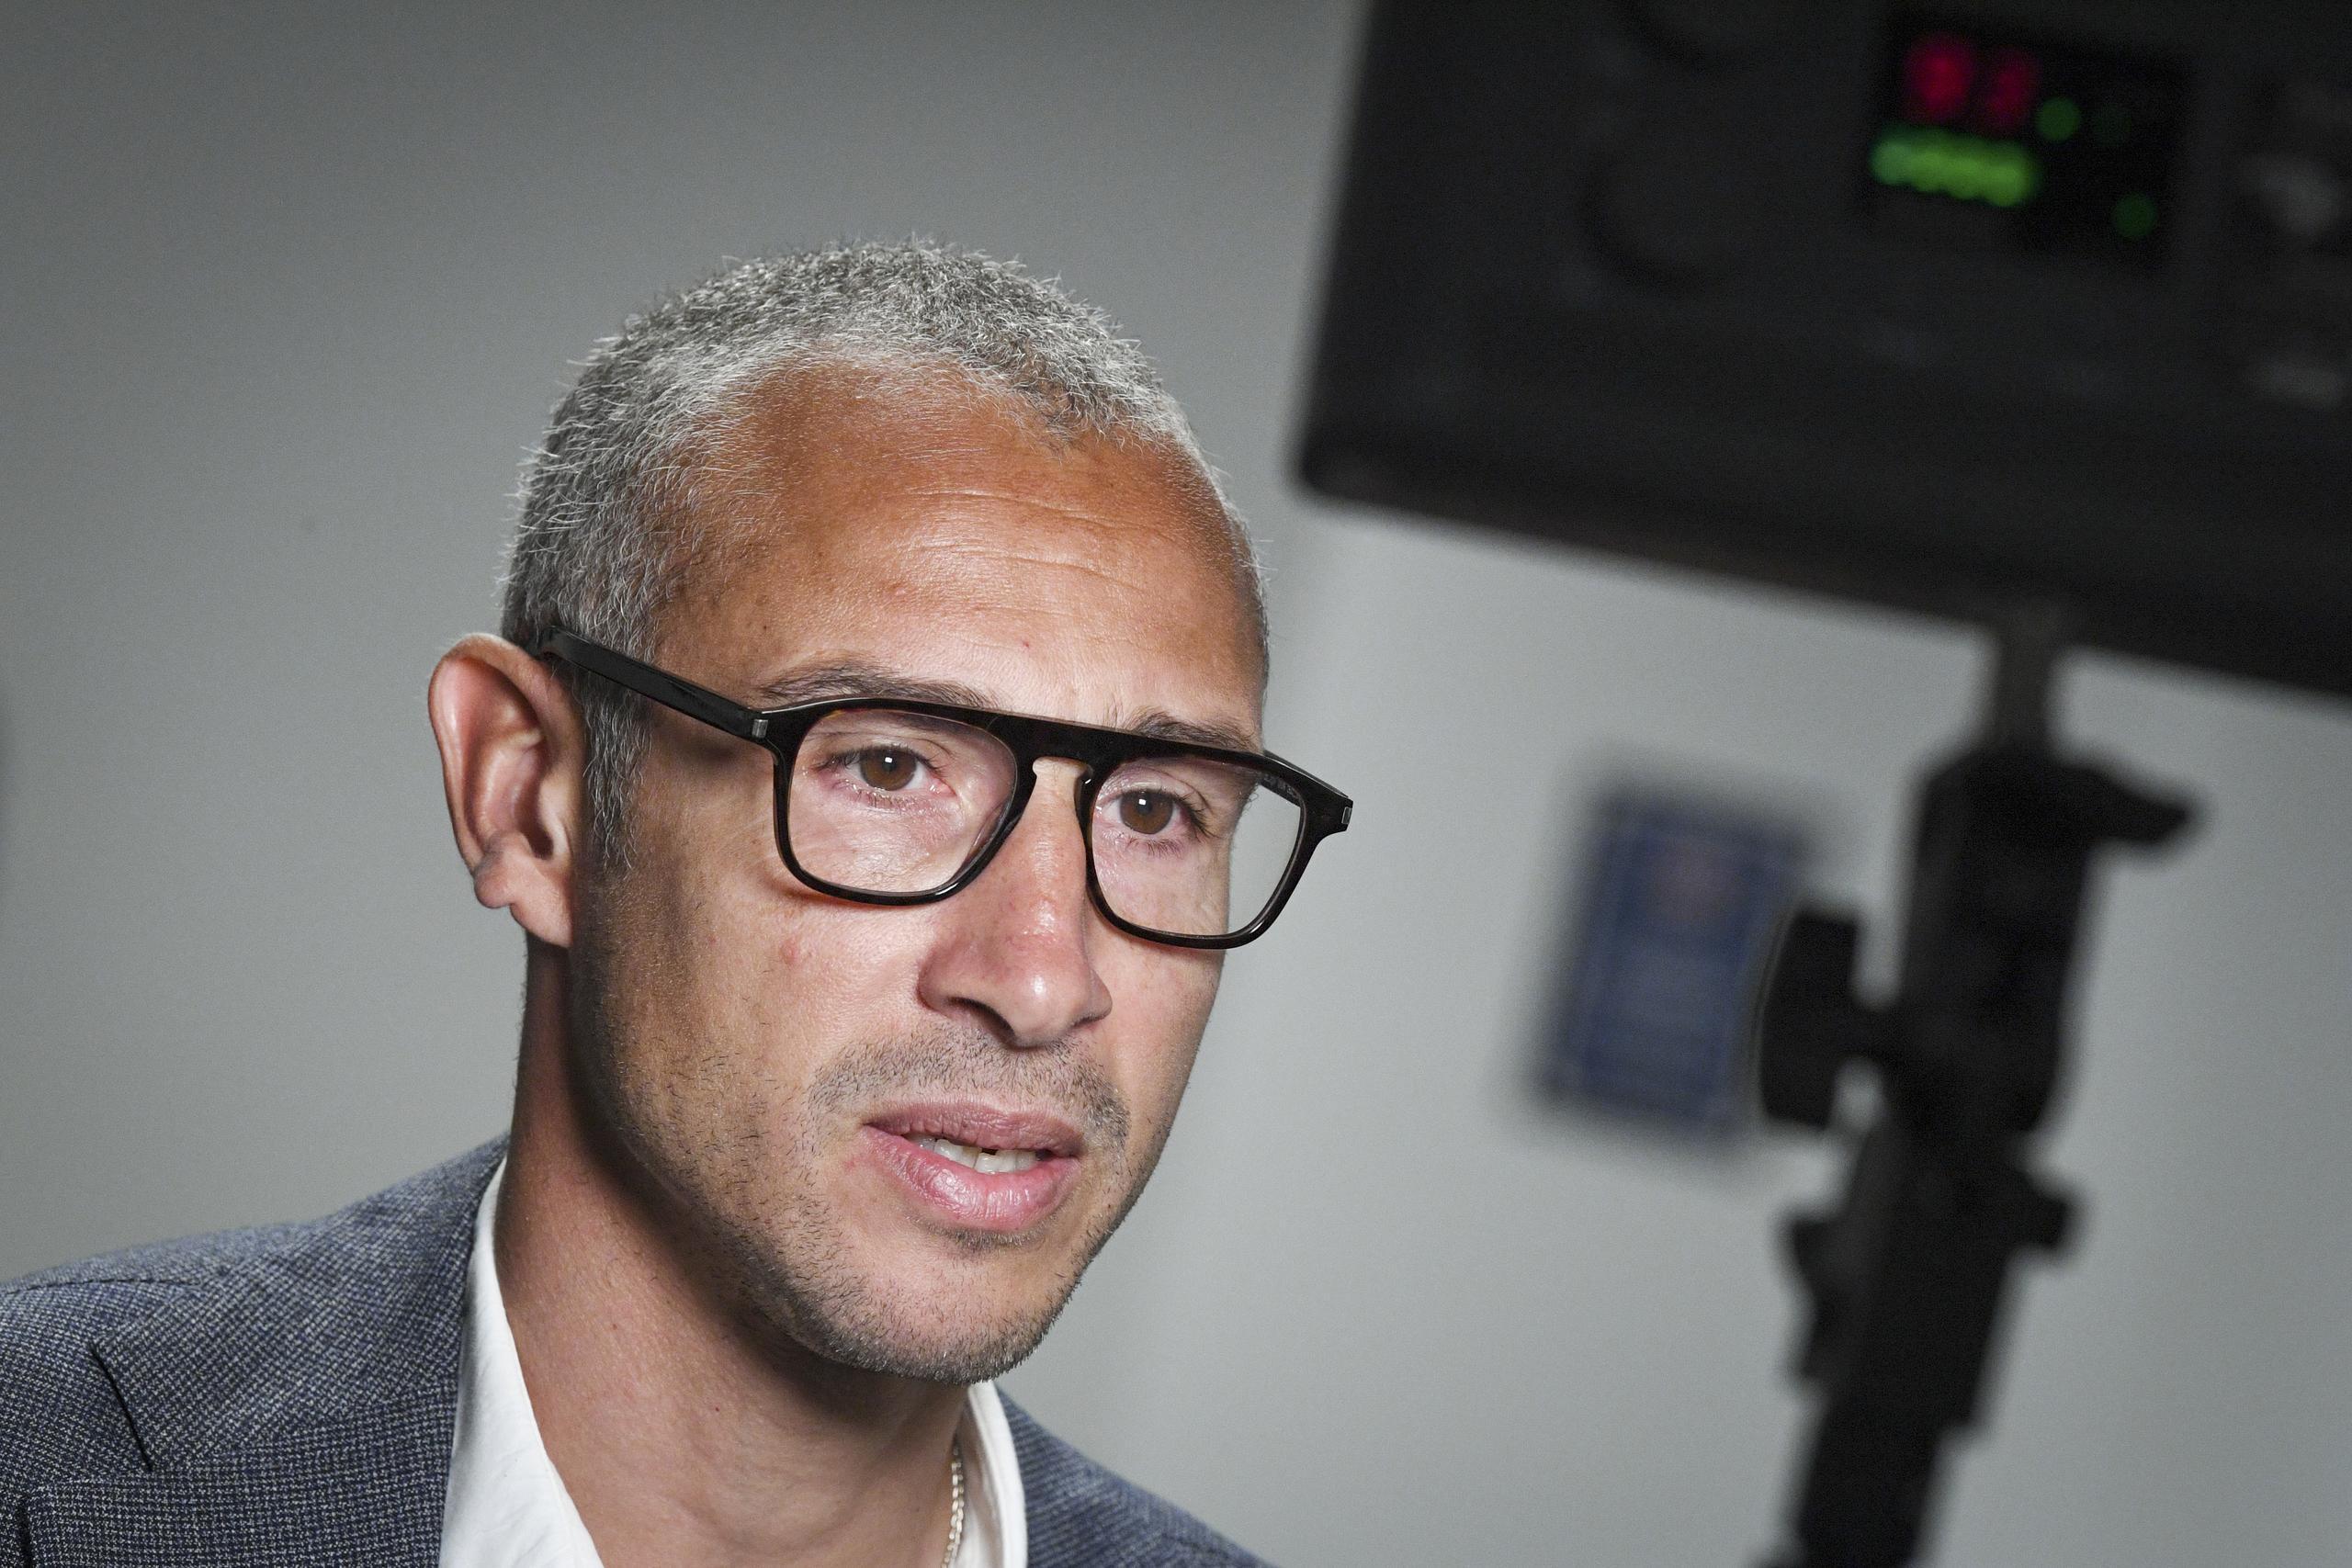 Henrik Larsson om rasismen som bestämde hans efternamn